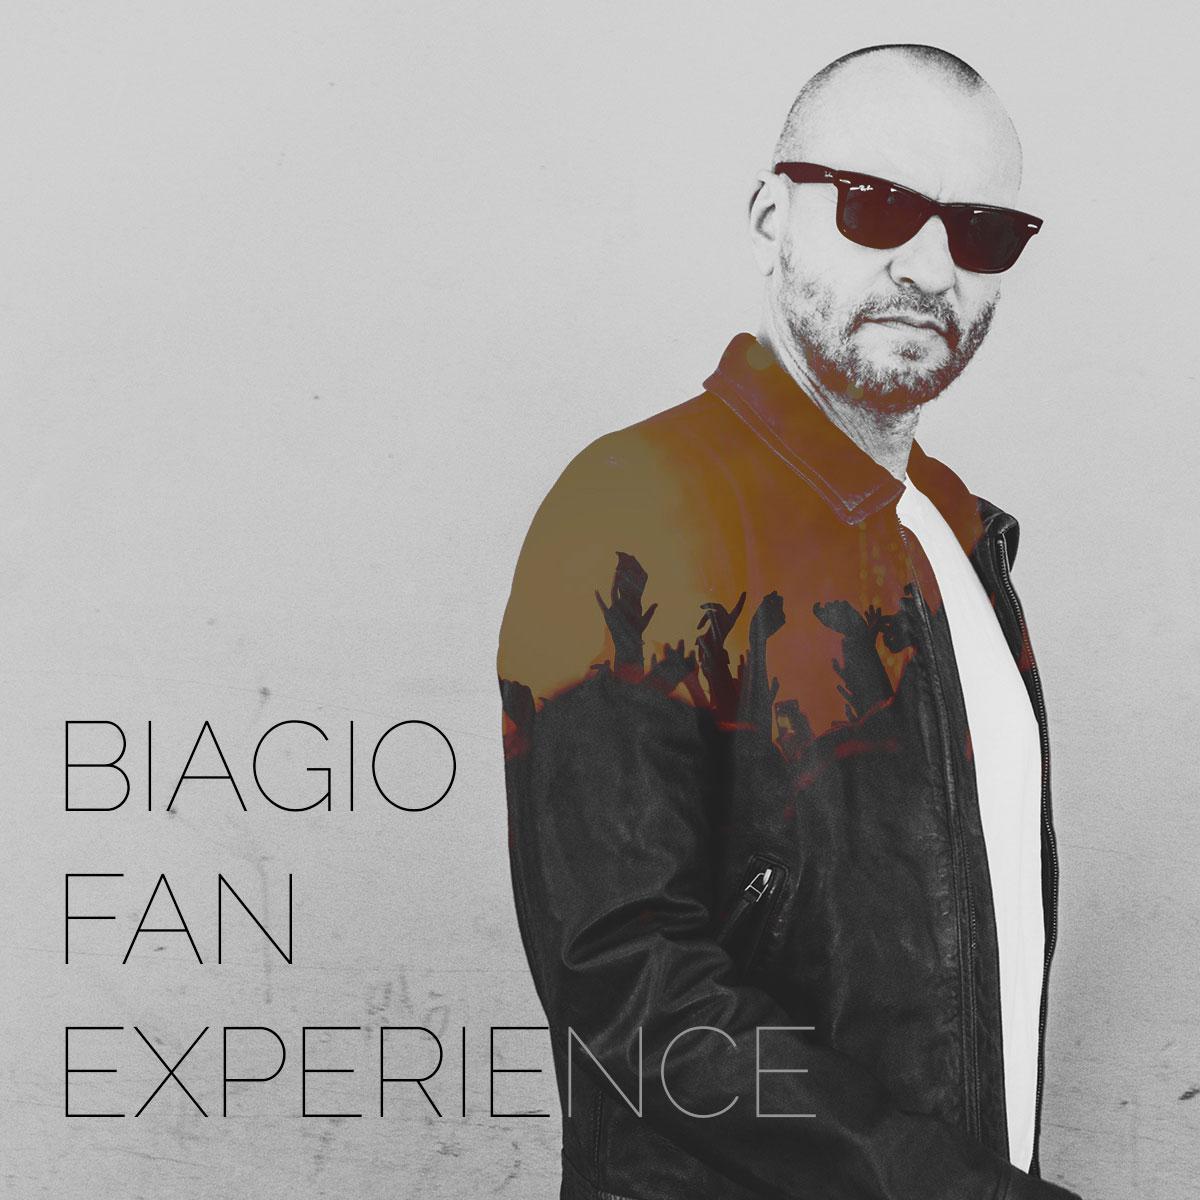 Biagio Fan Experience